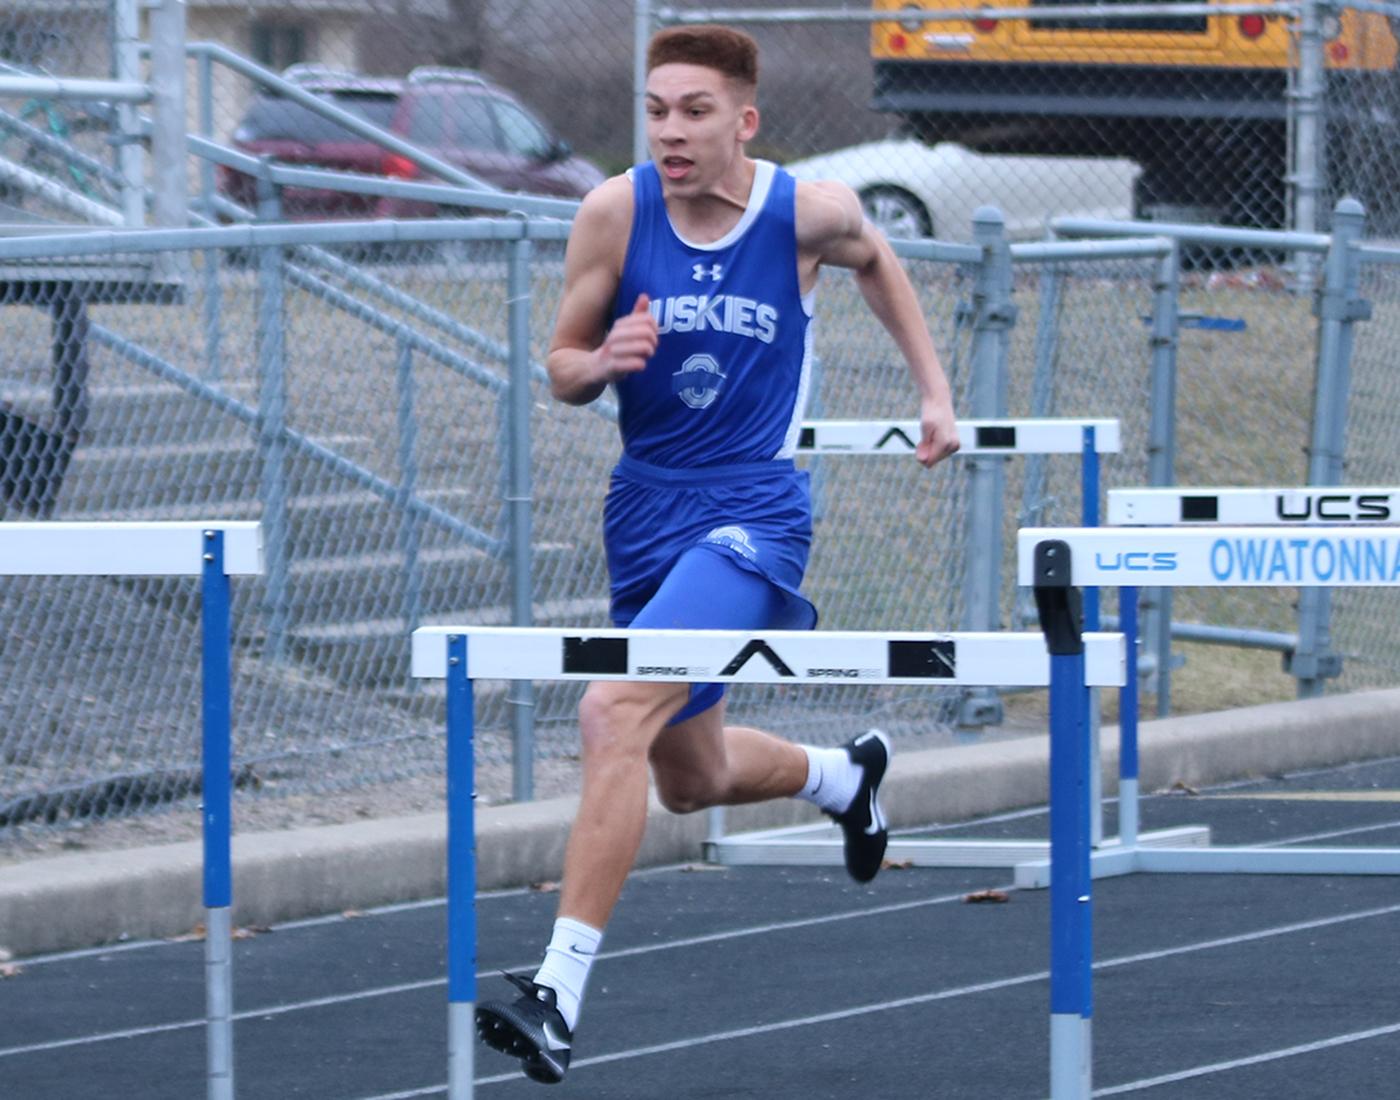 Keenan Young running 110 meter hurdles